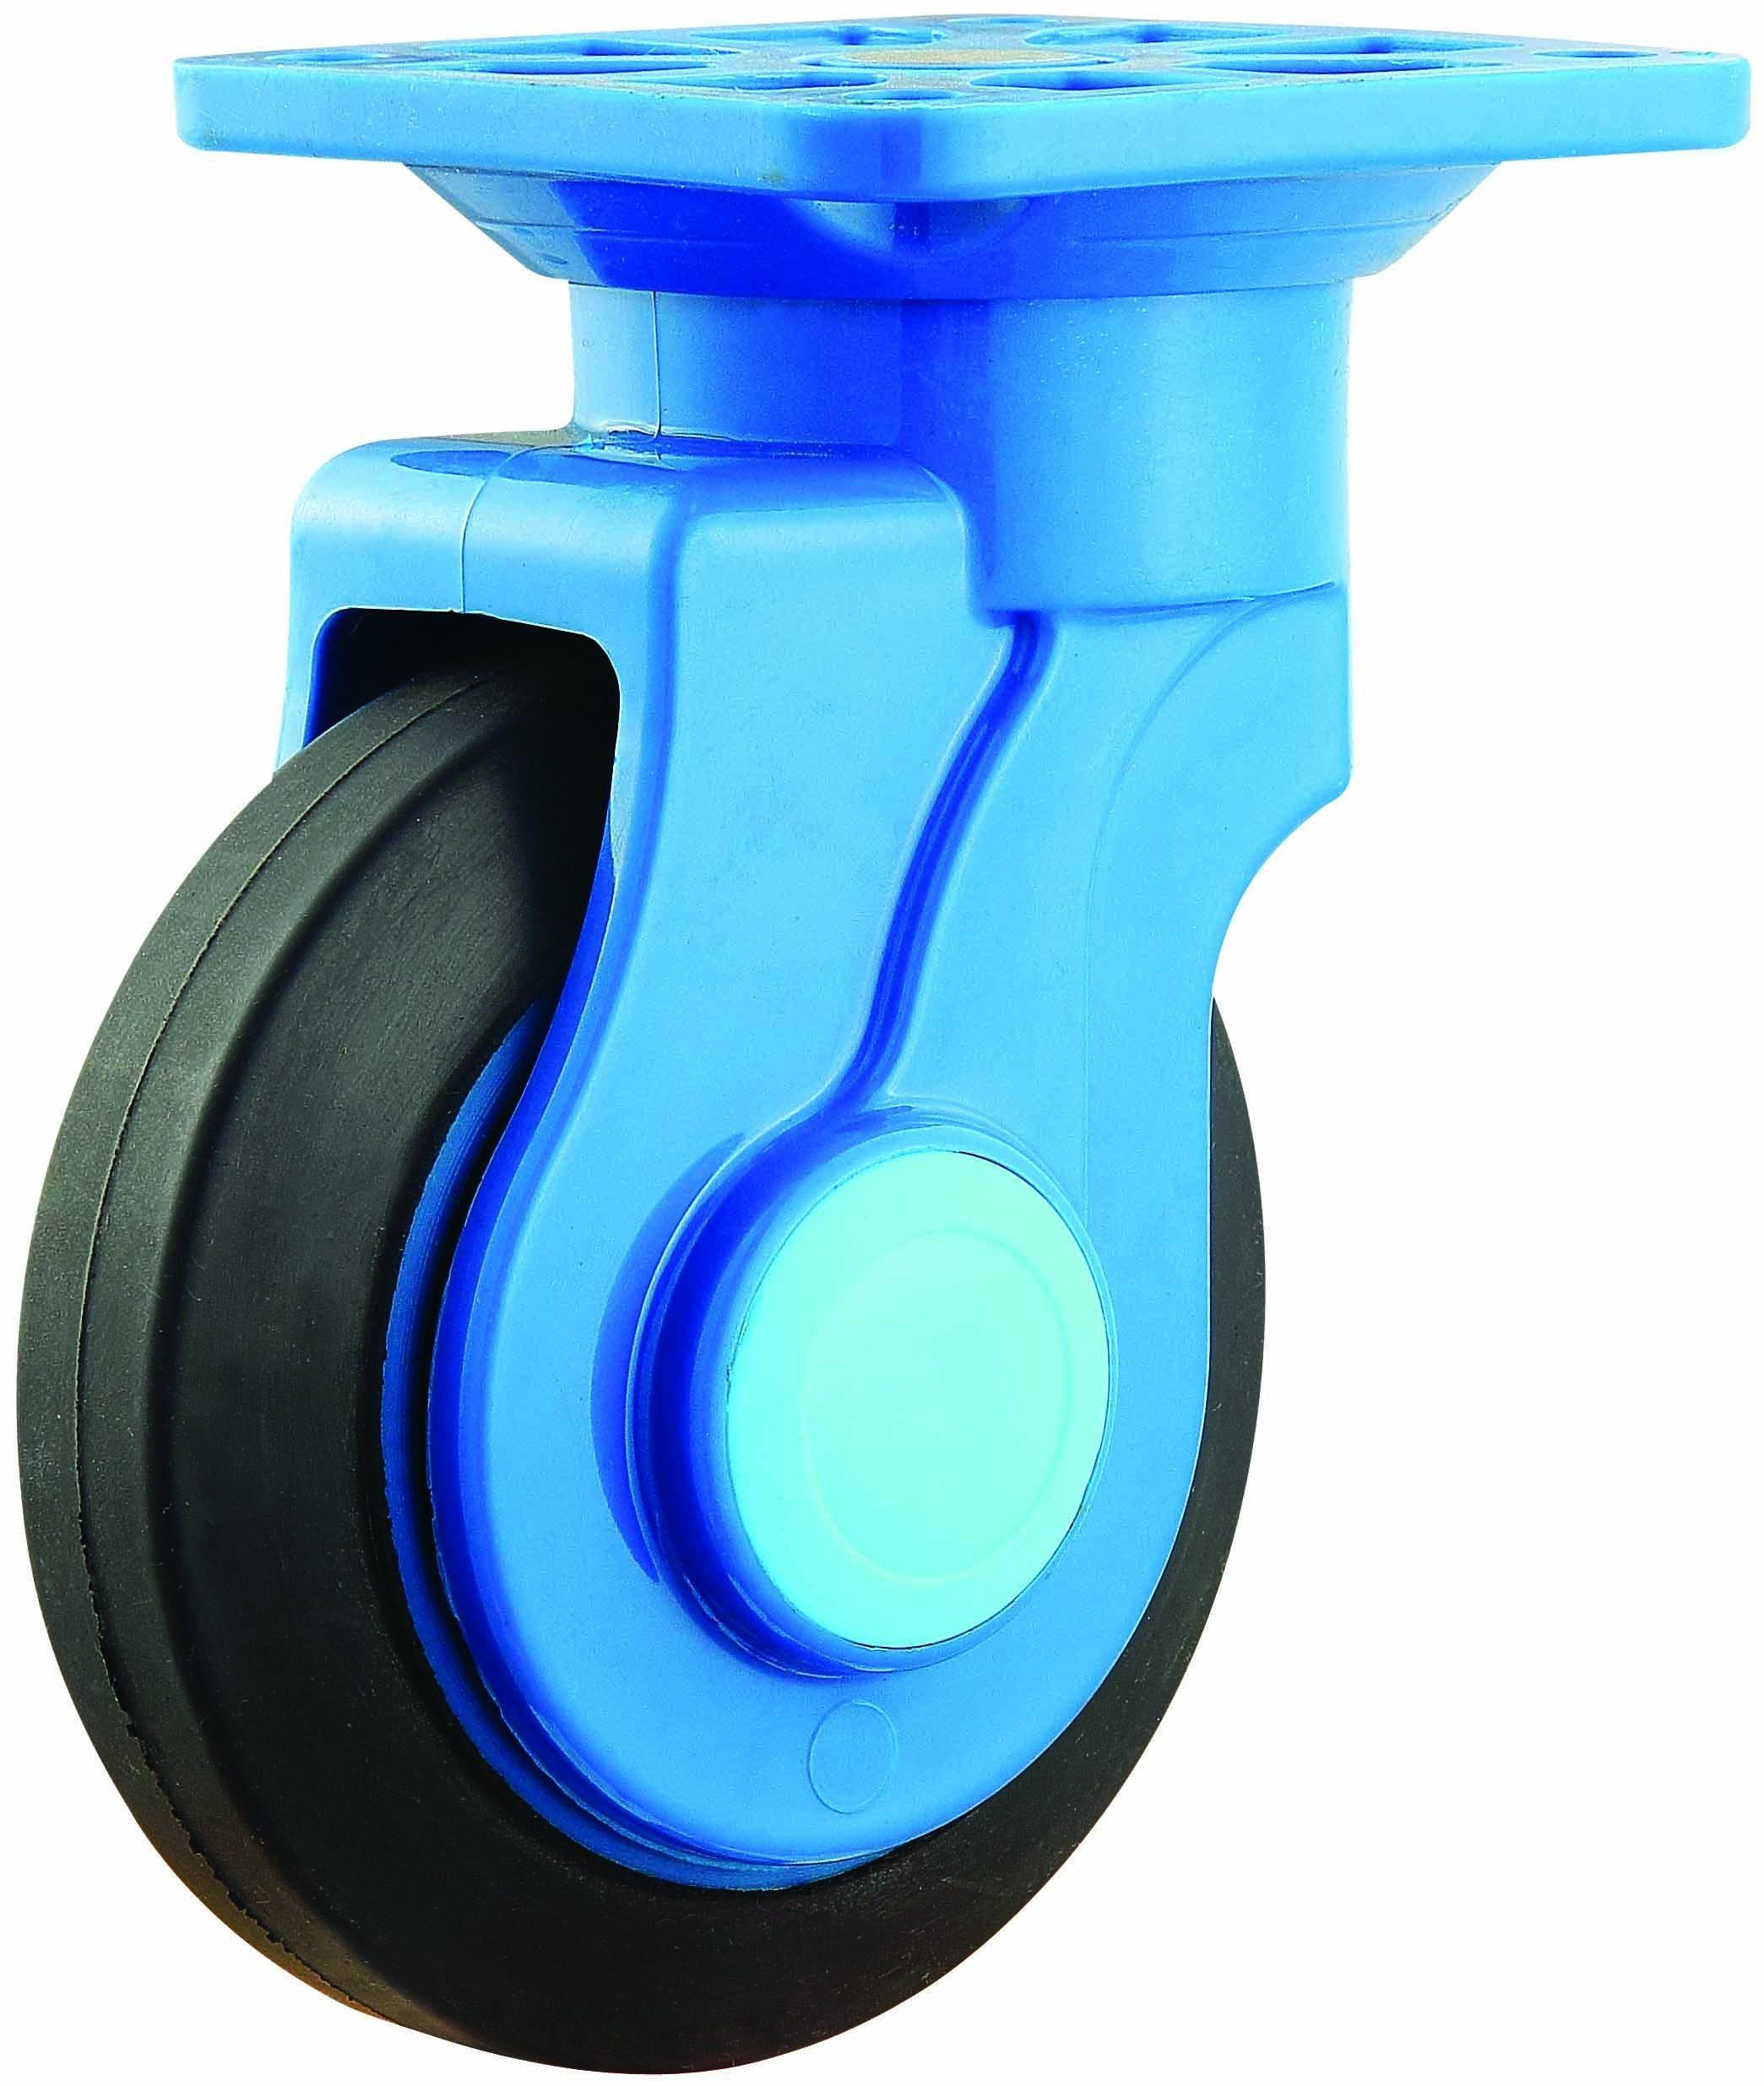 4/5 Inch Elastic Rubber Noiseless Trolley Castor with Nylon Bracket